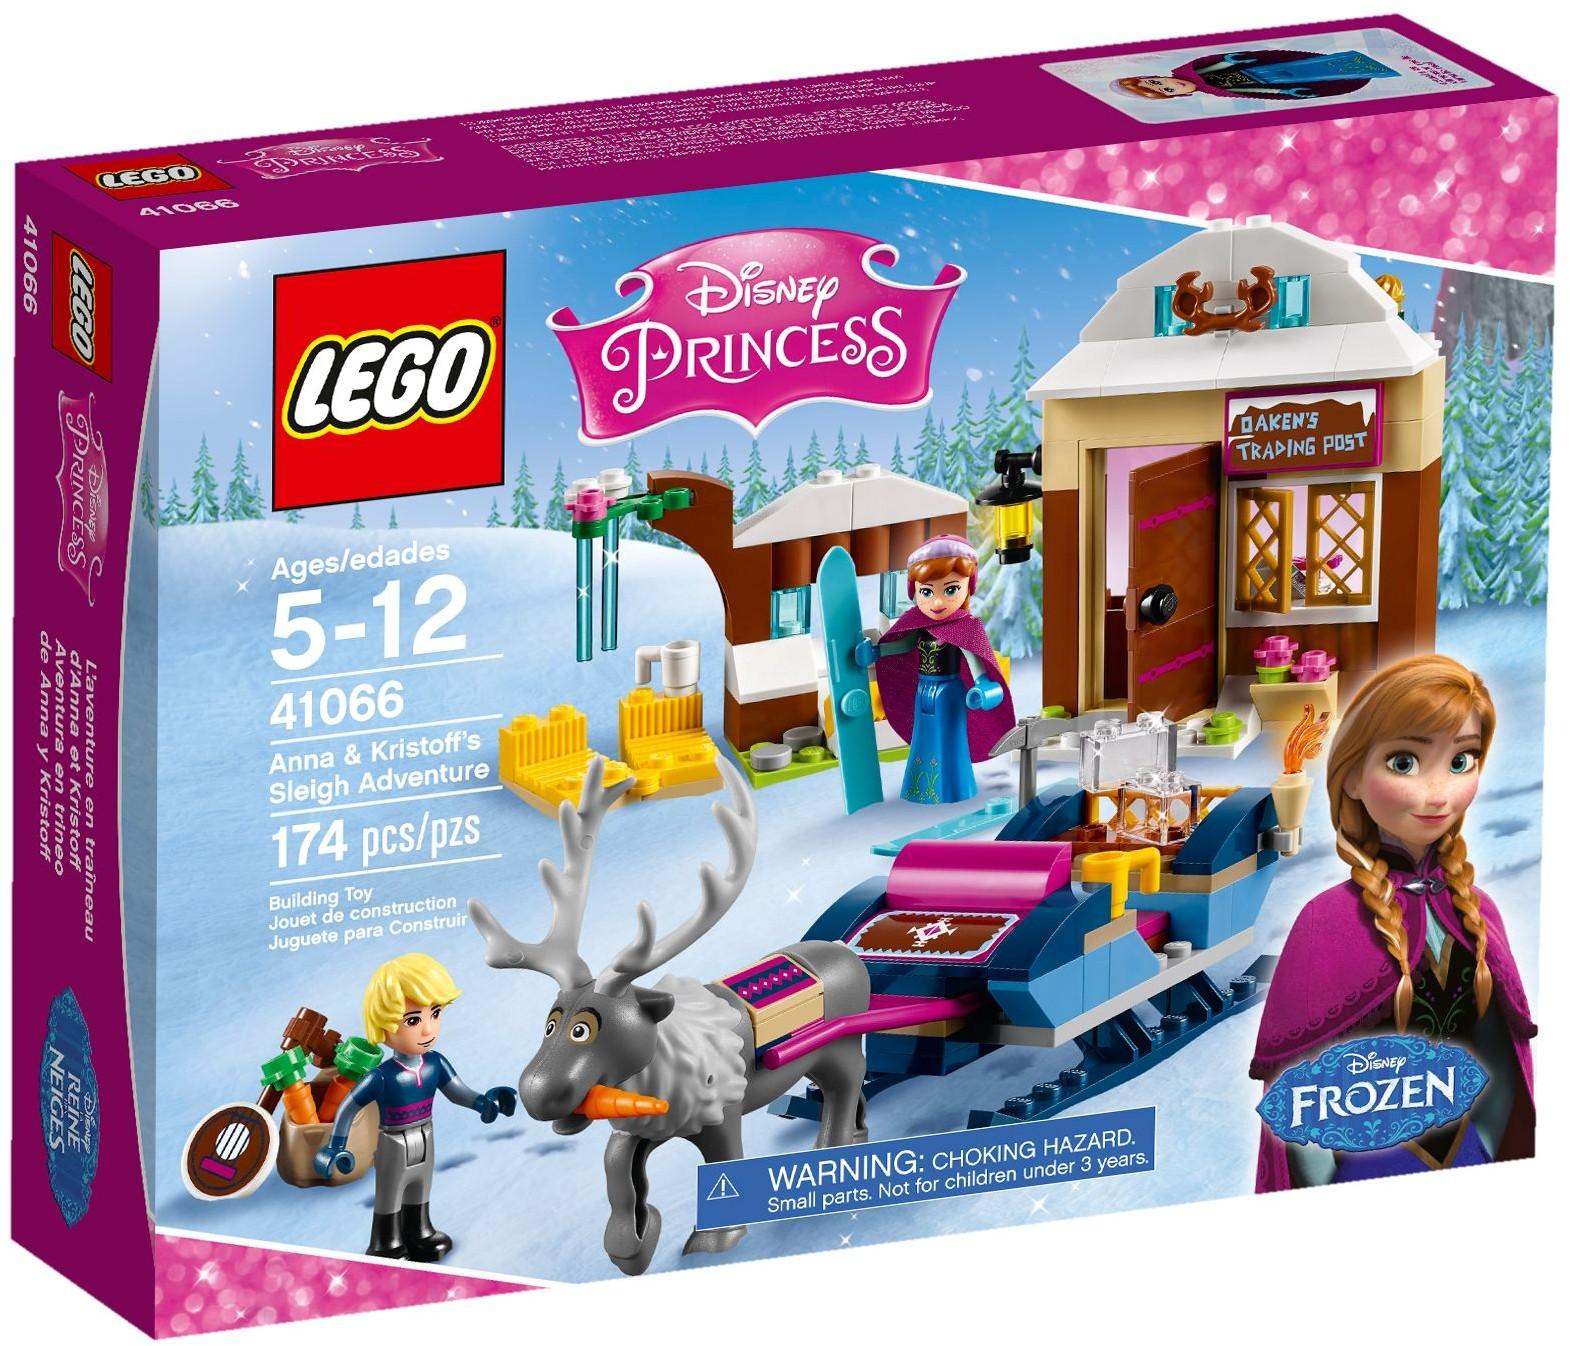 LEGO Disney 41066 Anna & Kristoff's Sleigh